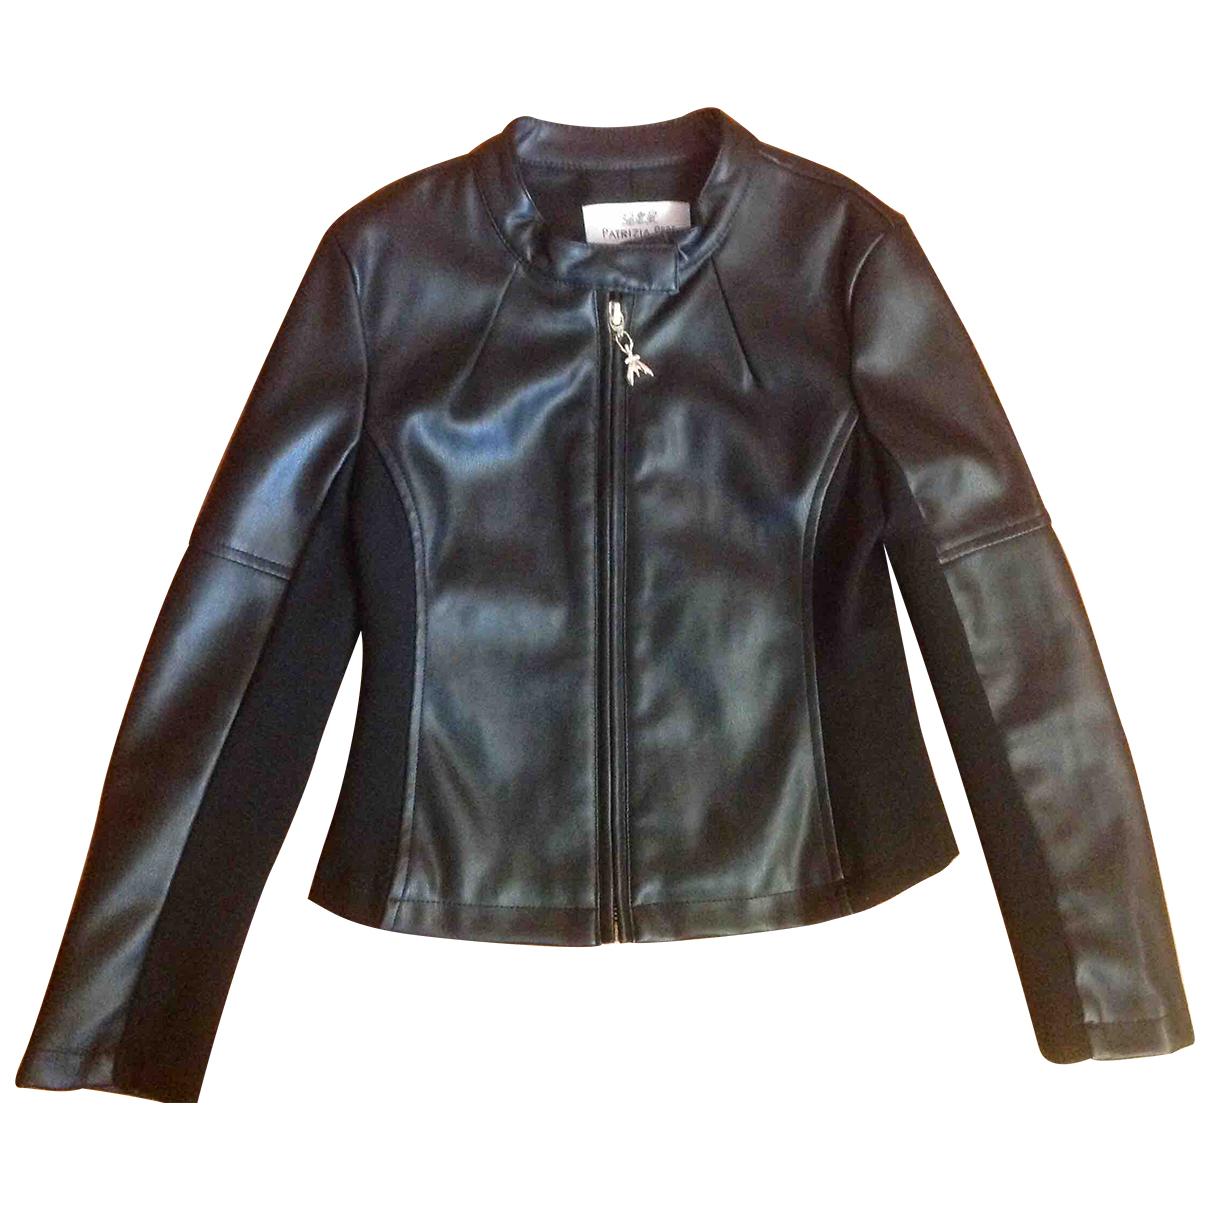 Patrizia Pepe N Black jacket & coat for Kids 6 years - up to 114cm FR